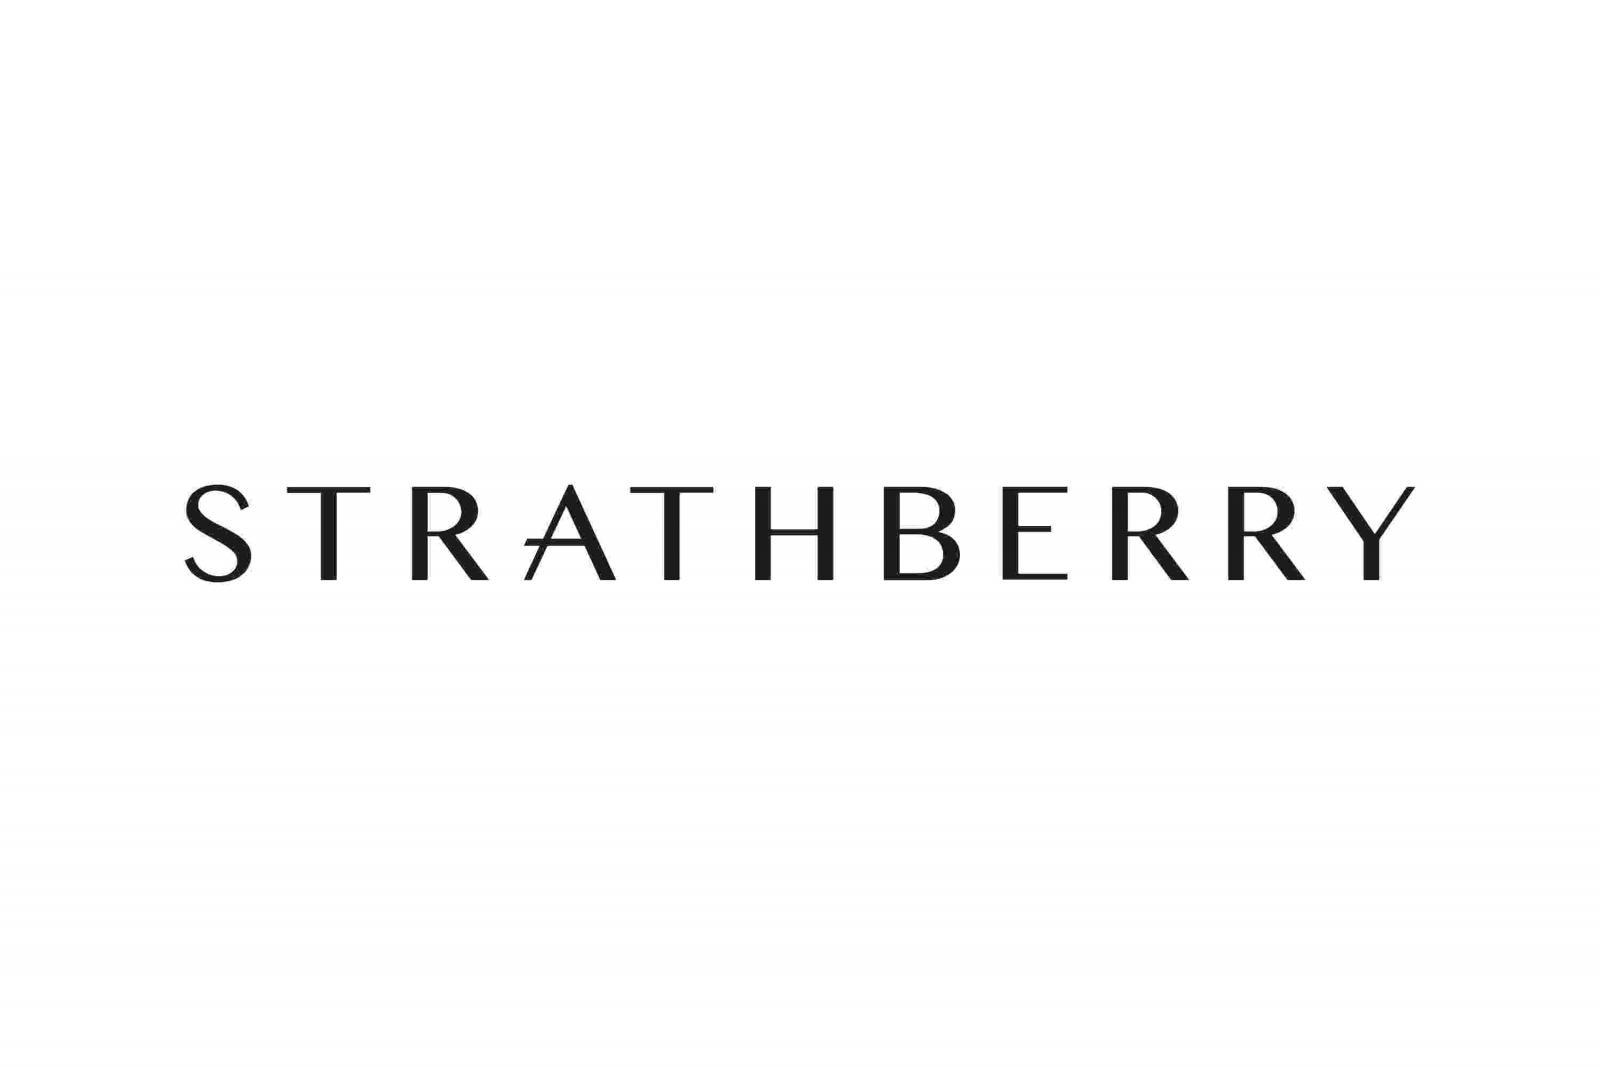 【10Why個為什麼】凱特王妃穿搭必備Strathberry包包!不到2萬擁有全手工打造精品,10點解析它的爆紅原因-3